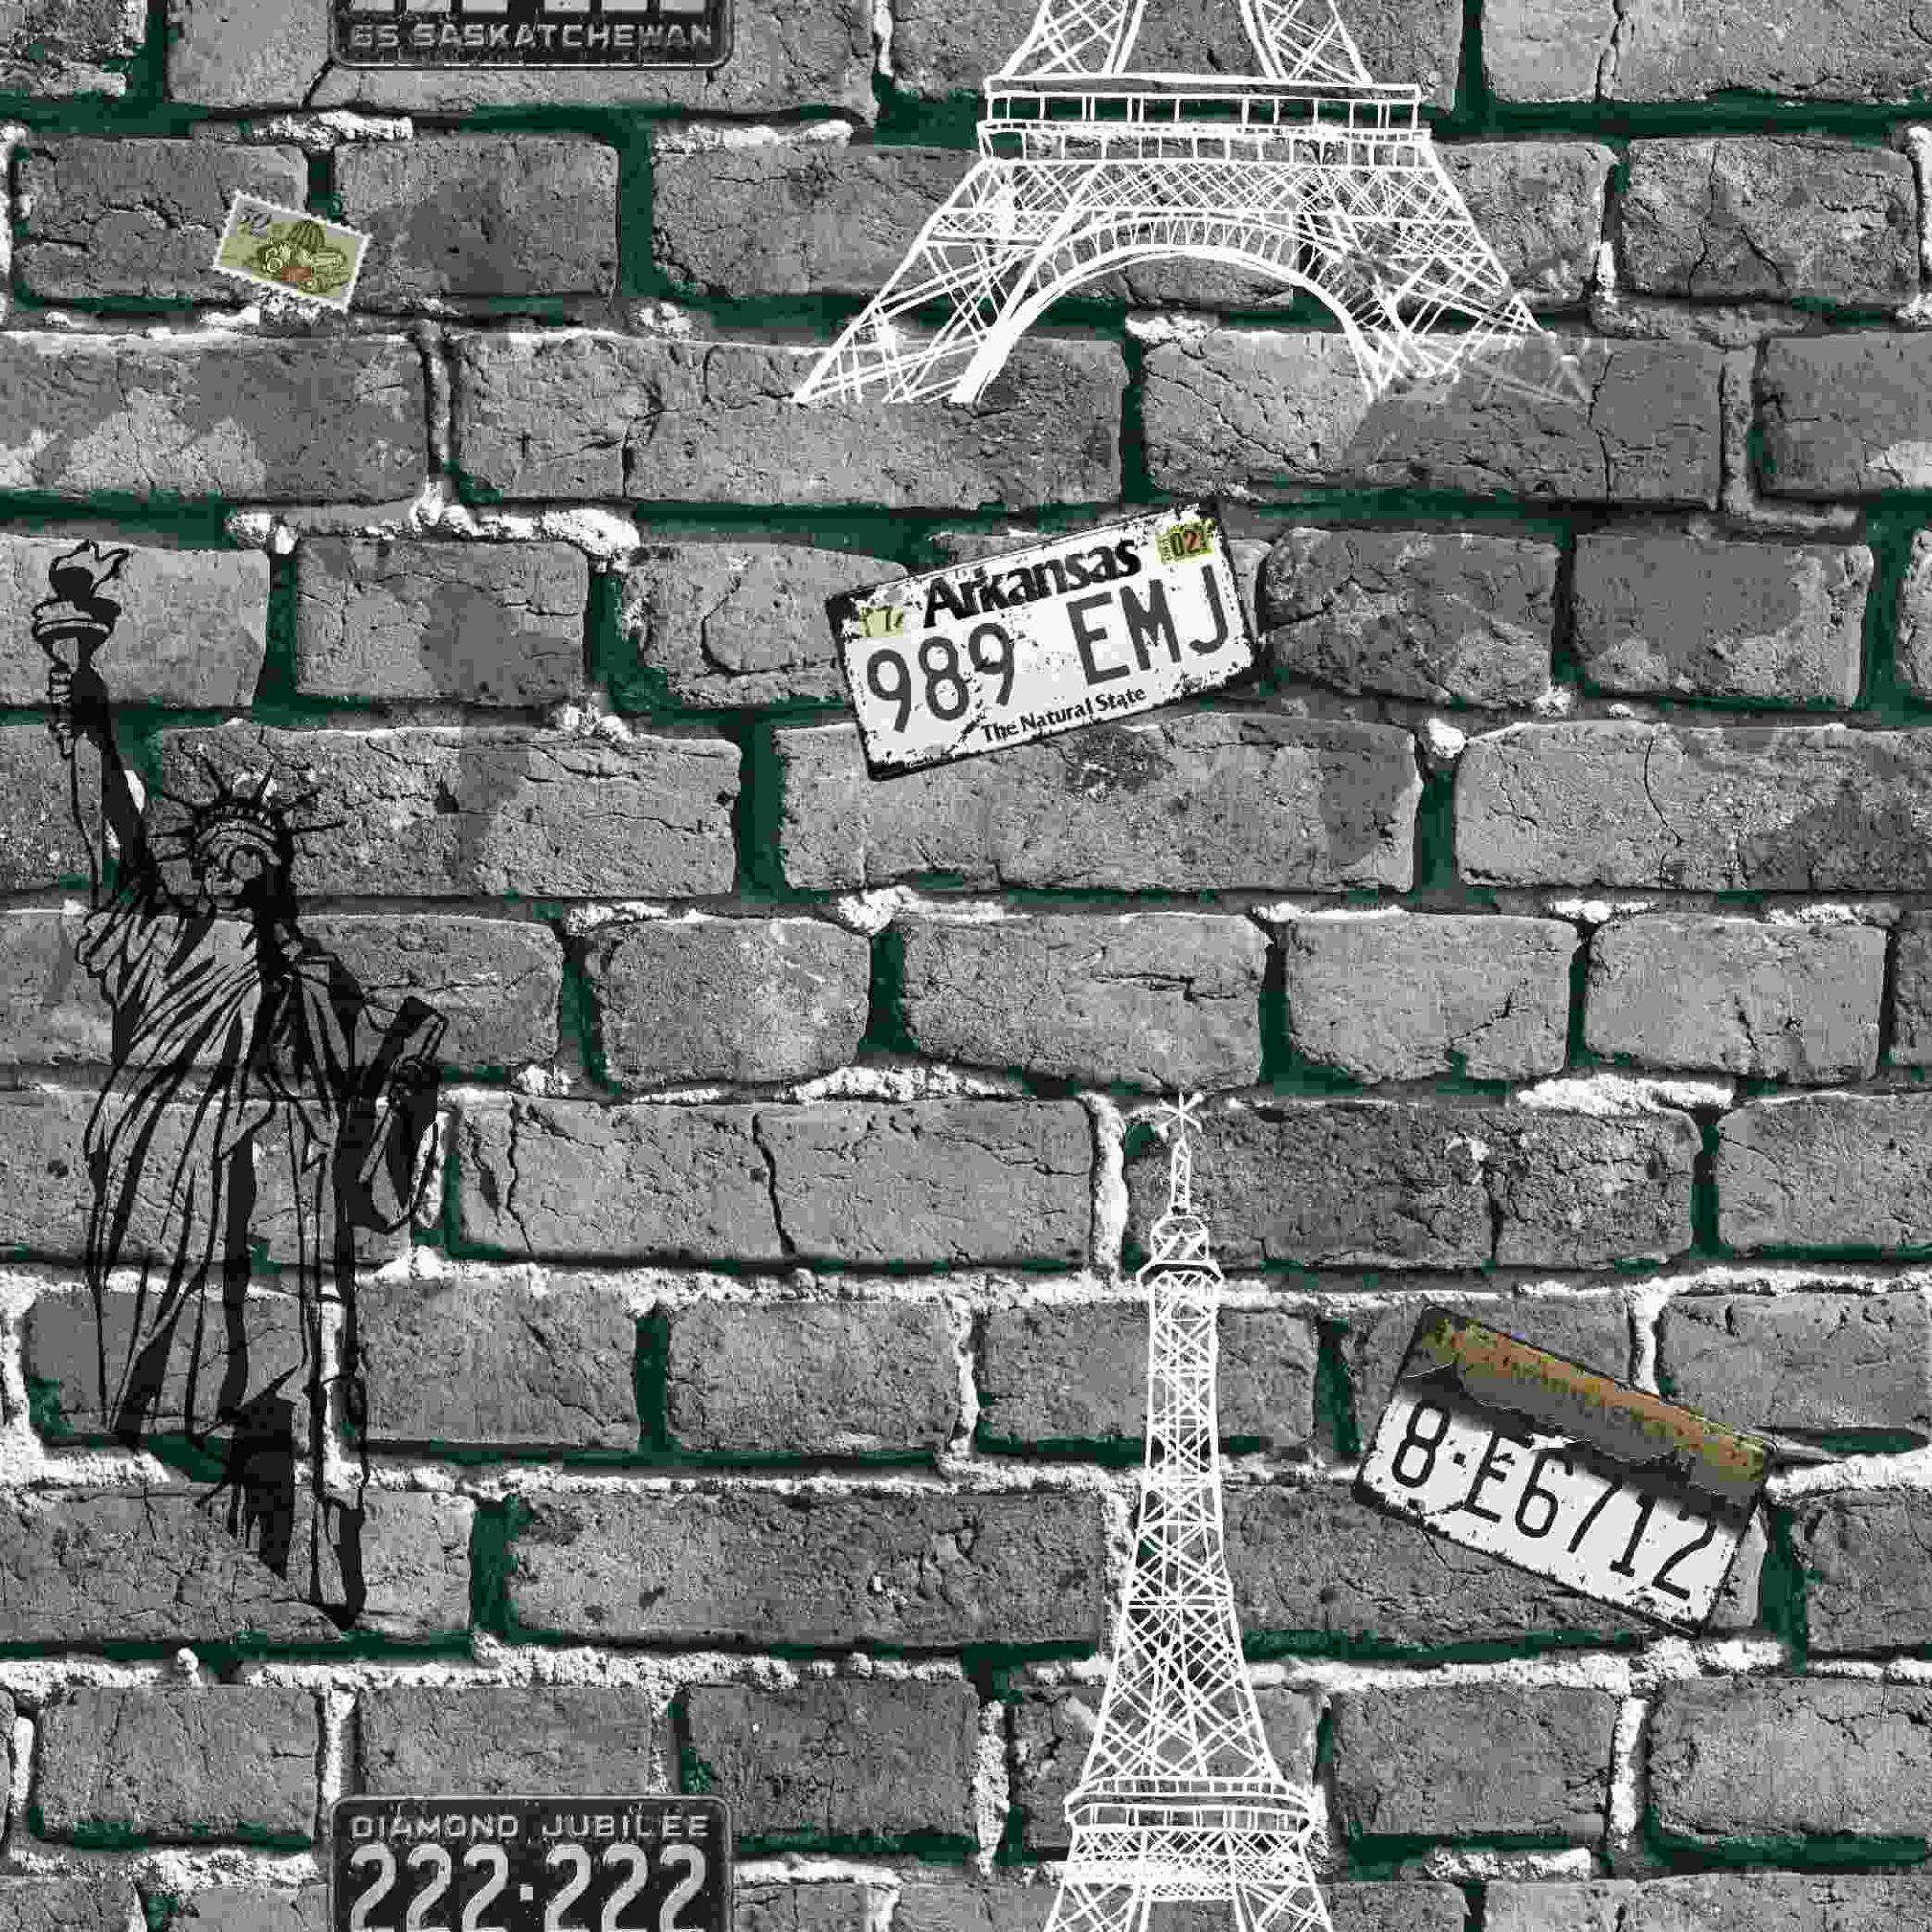 Papel de Parede Kan Tai Vinílico Coleção Neonature 5 Tijolo Cidades Cinza Escuro